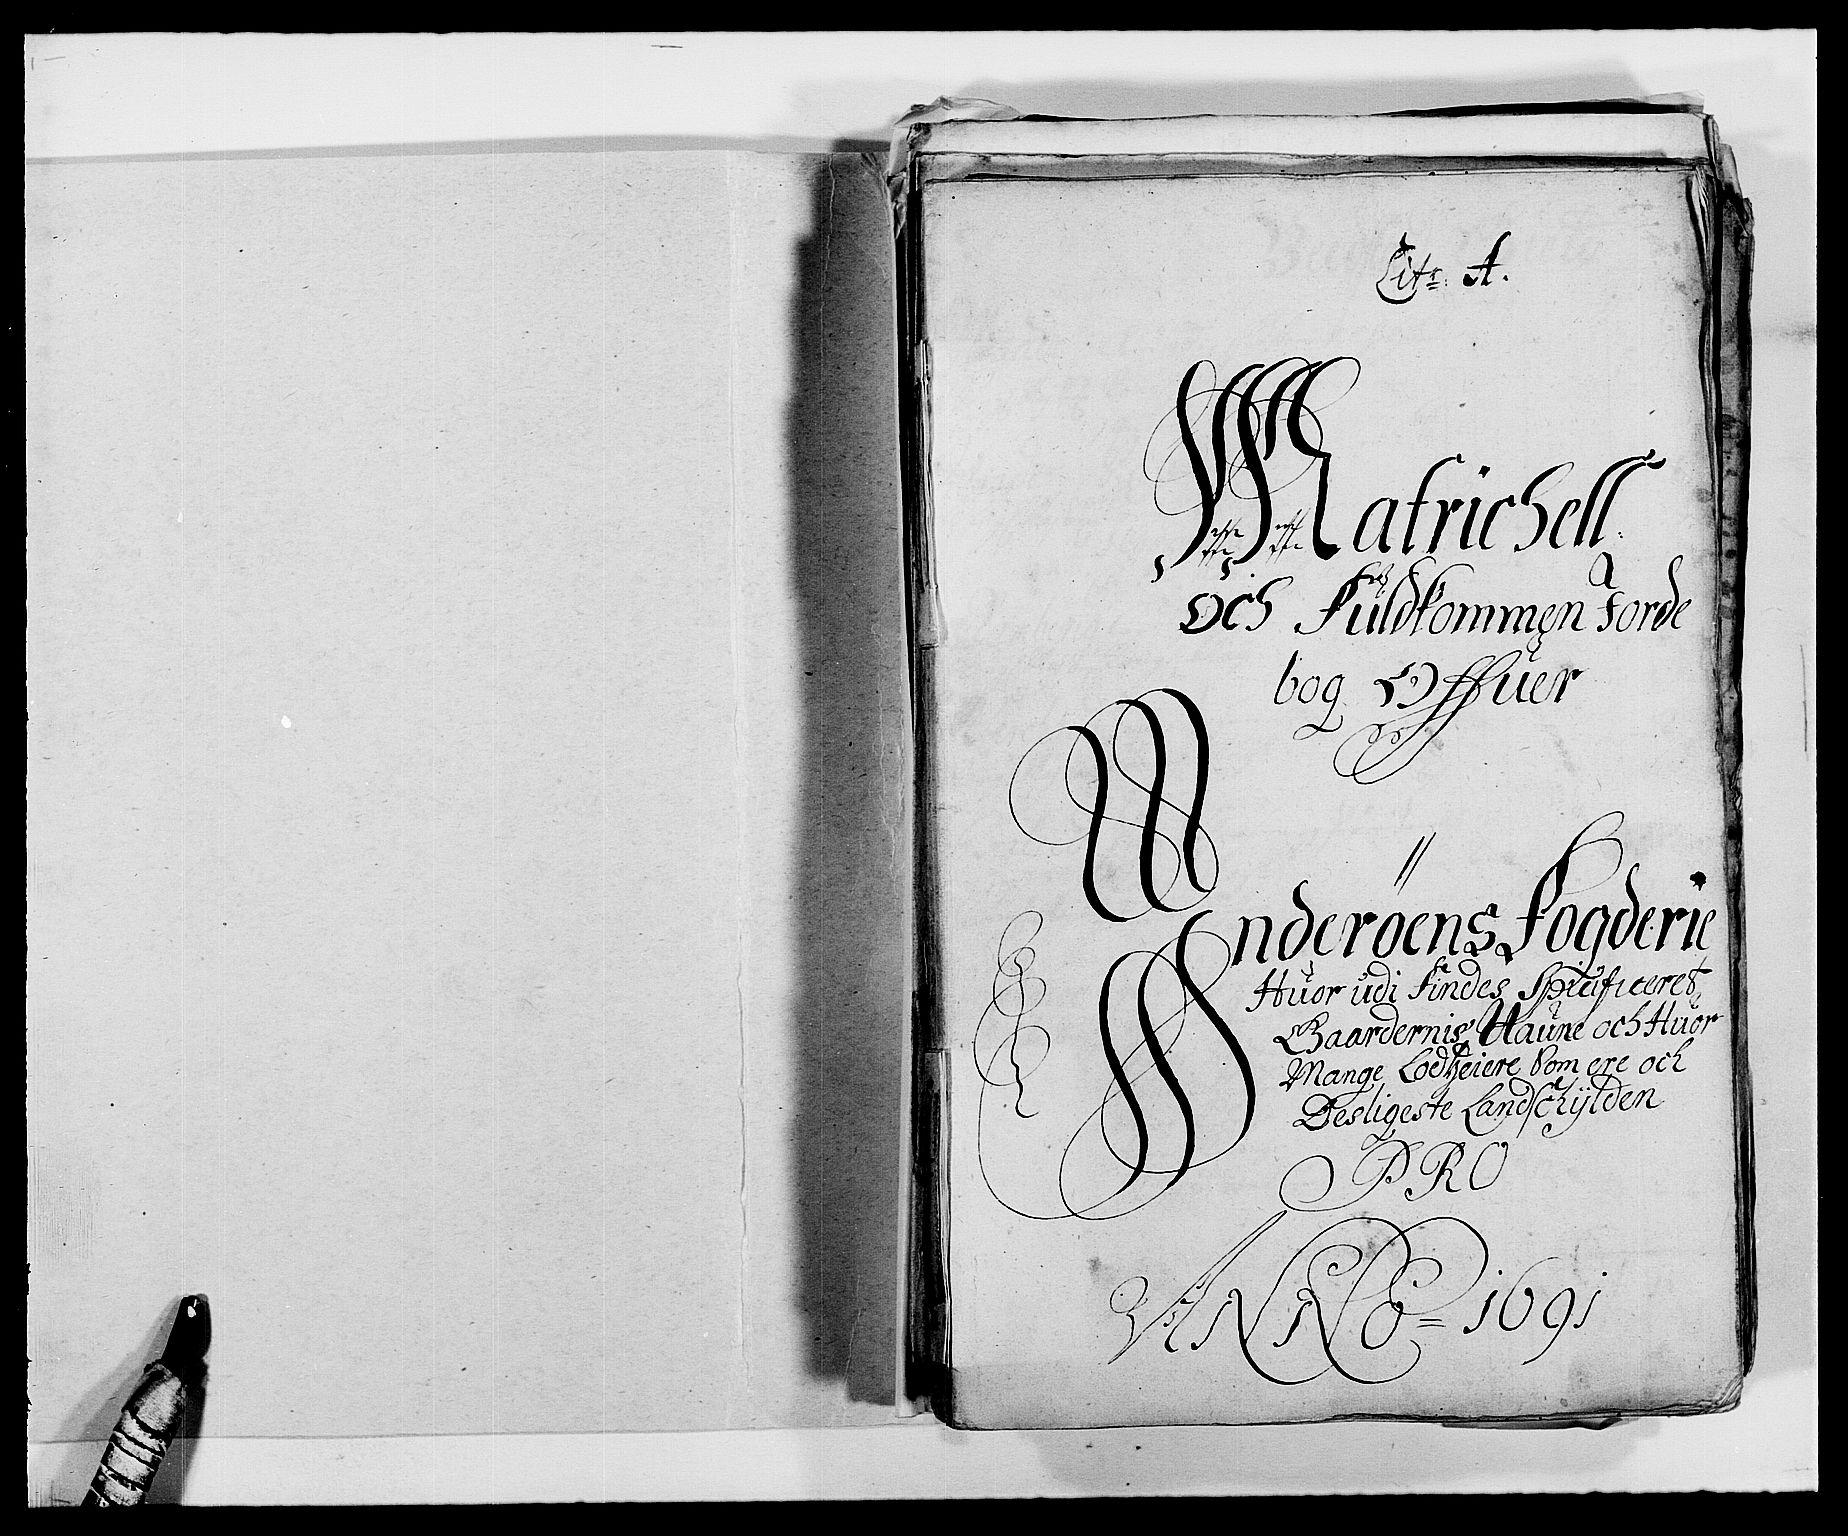 RA, Rentekammeret inntil 1814, Reviderte regnskaper, Fogderegnskap, R63/L4307: Fogderegnskap Inderøy, 1690-1691, s. 233